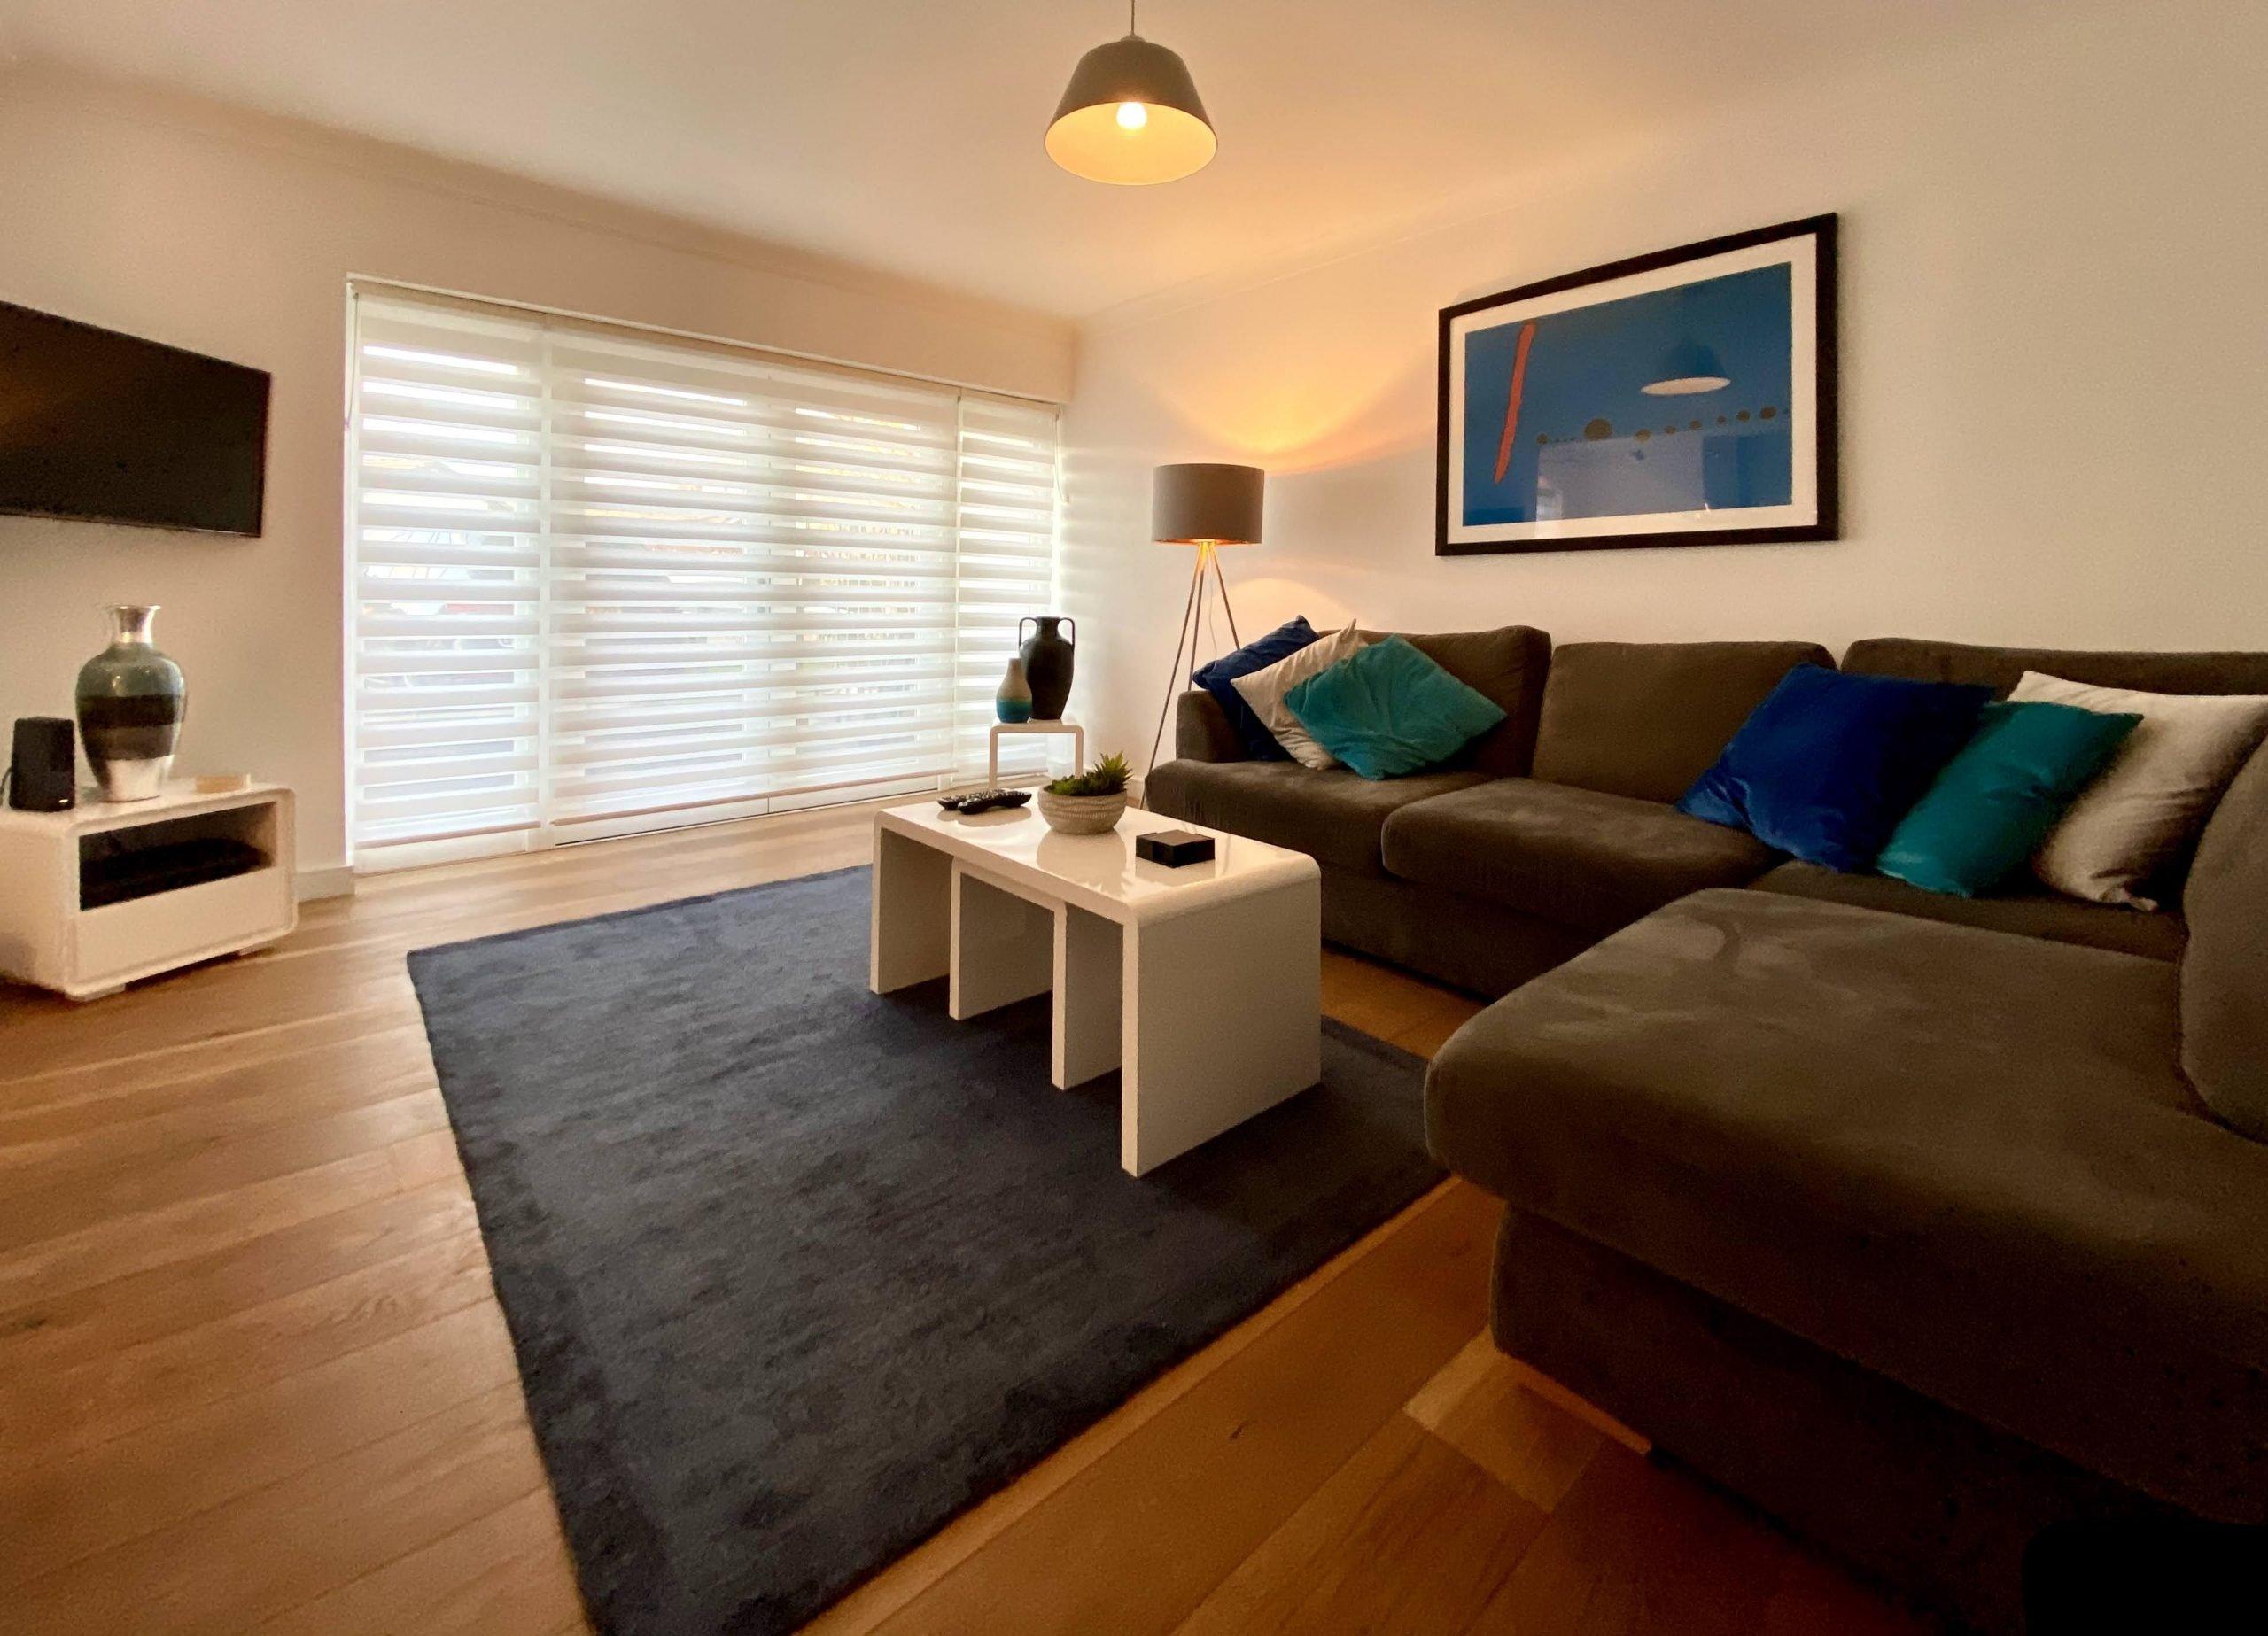 Rental apartment in Alderley Edge